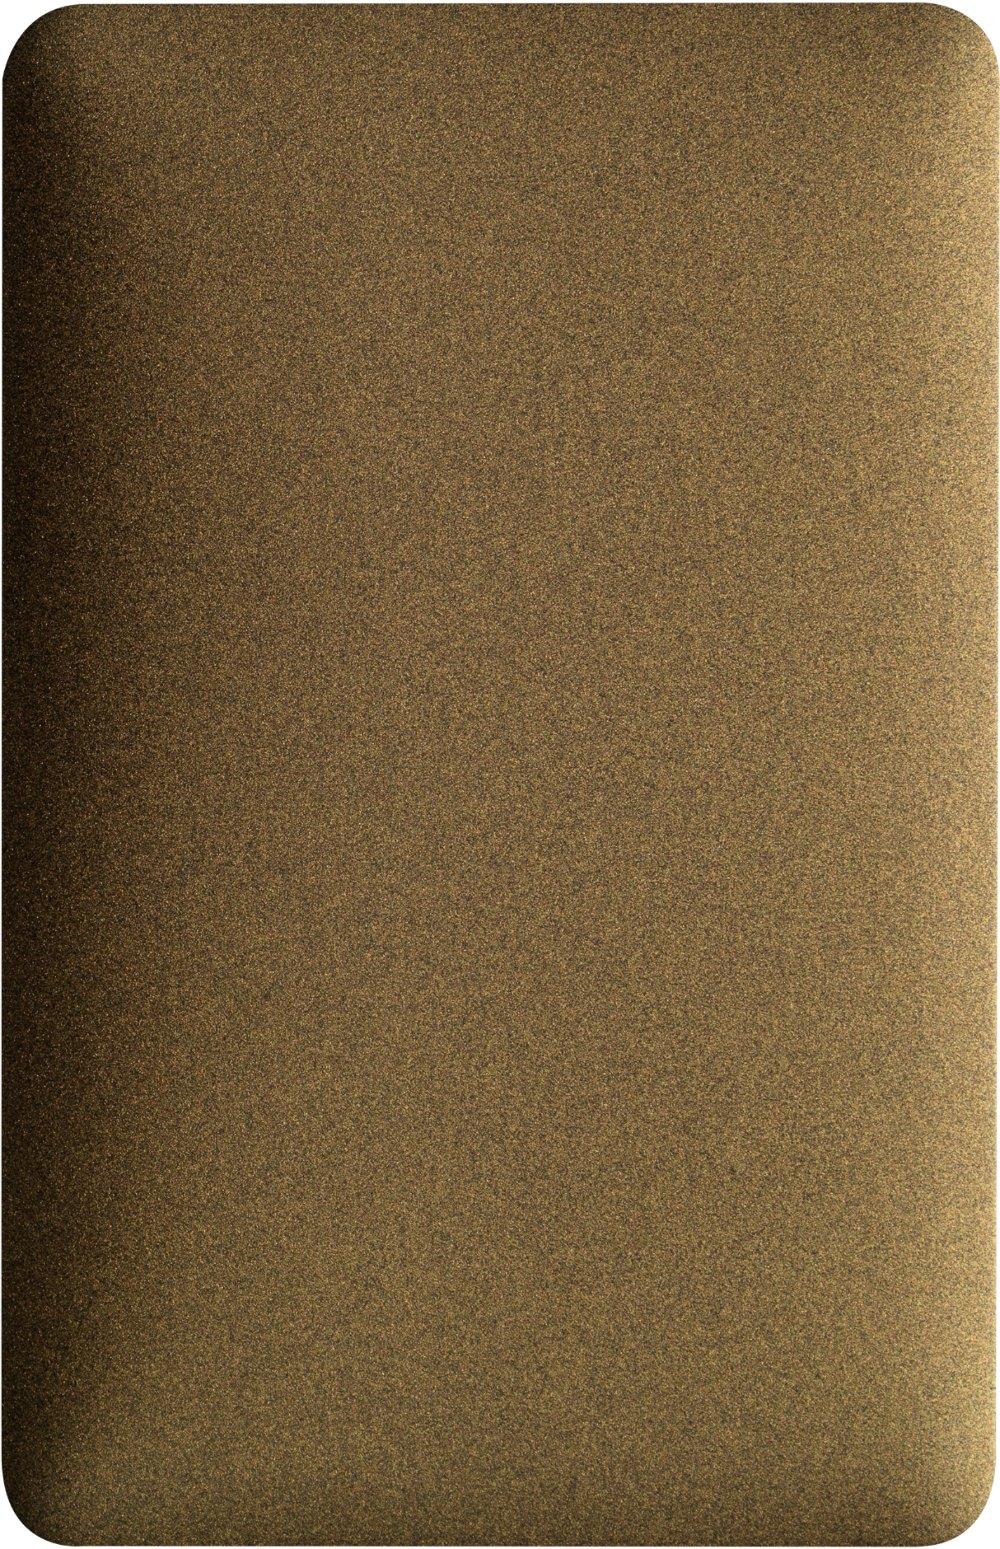 ECP Anomax 3L Euras 33 Middle Bronze